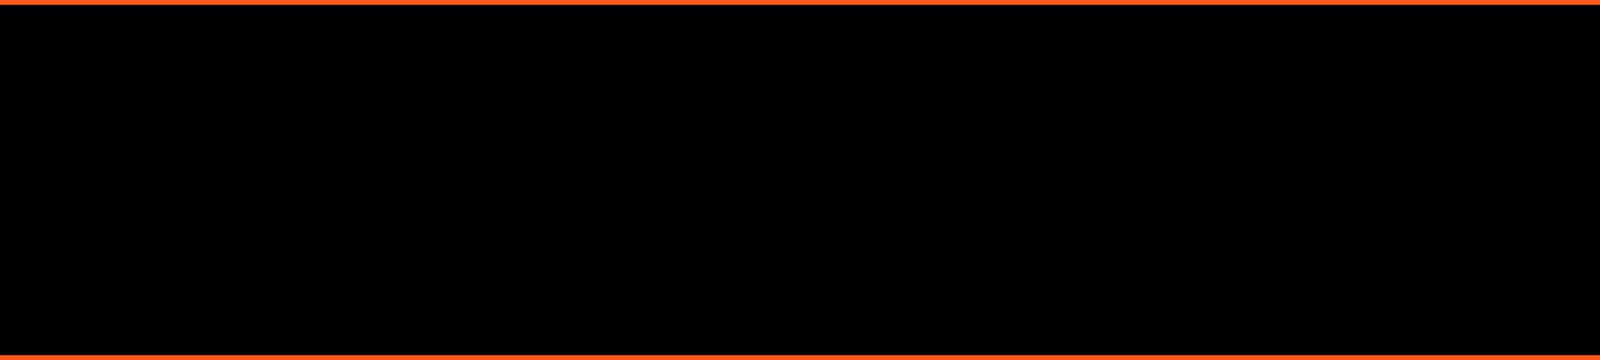 slide_video360_negro